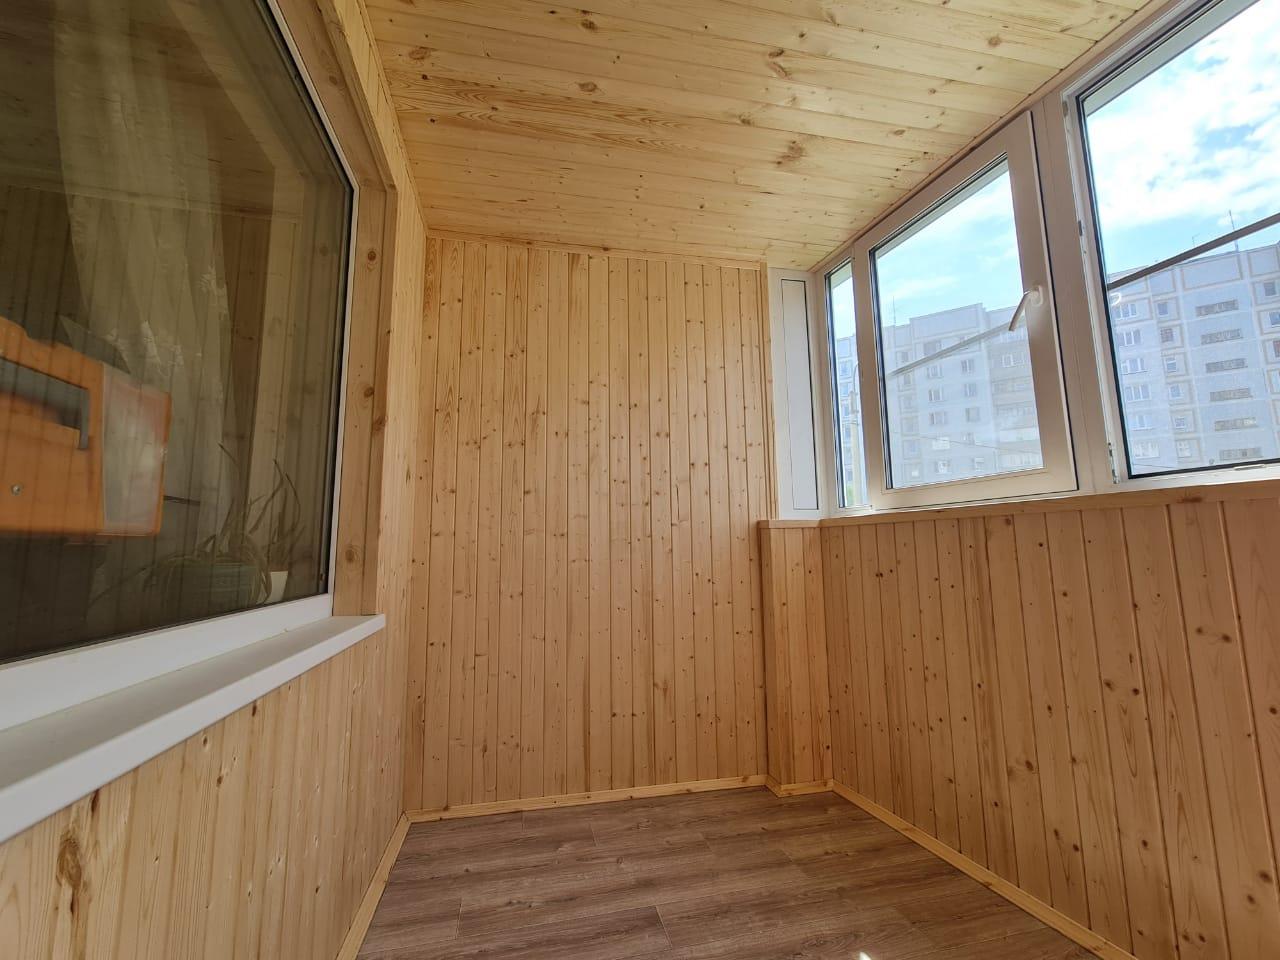 Обшивка, утепление, пропитка и линолеум на пол на балконе Фучика 125 - фото